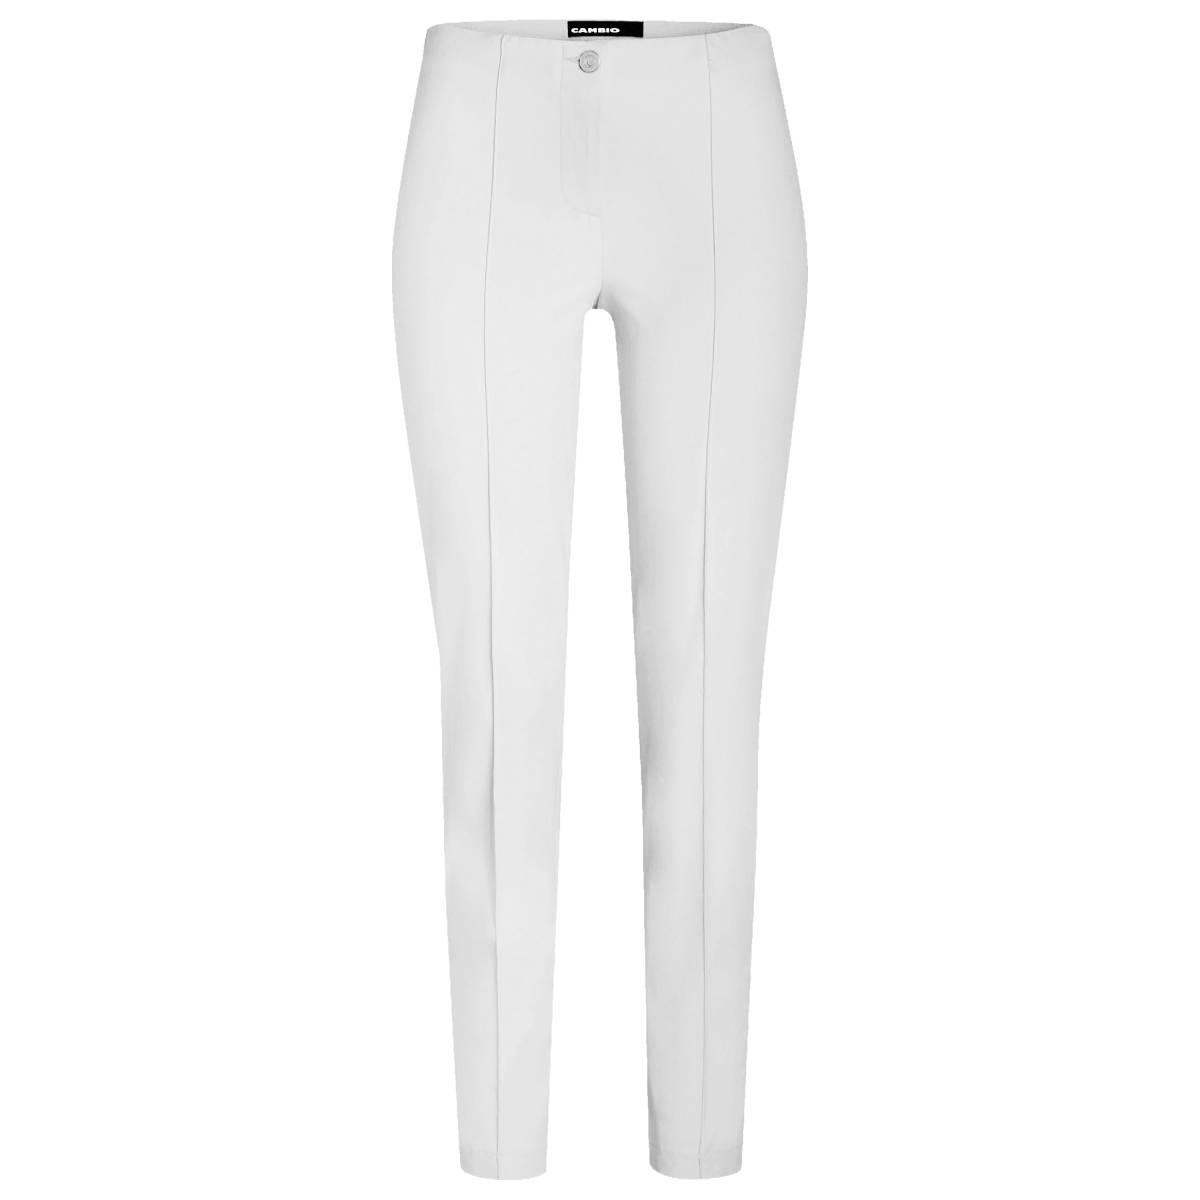 CAMBIO pantalon ros L29-3